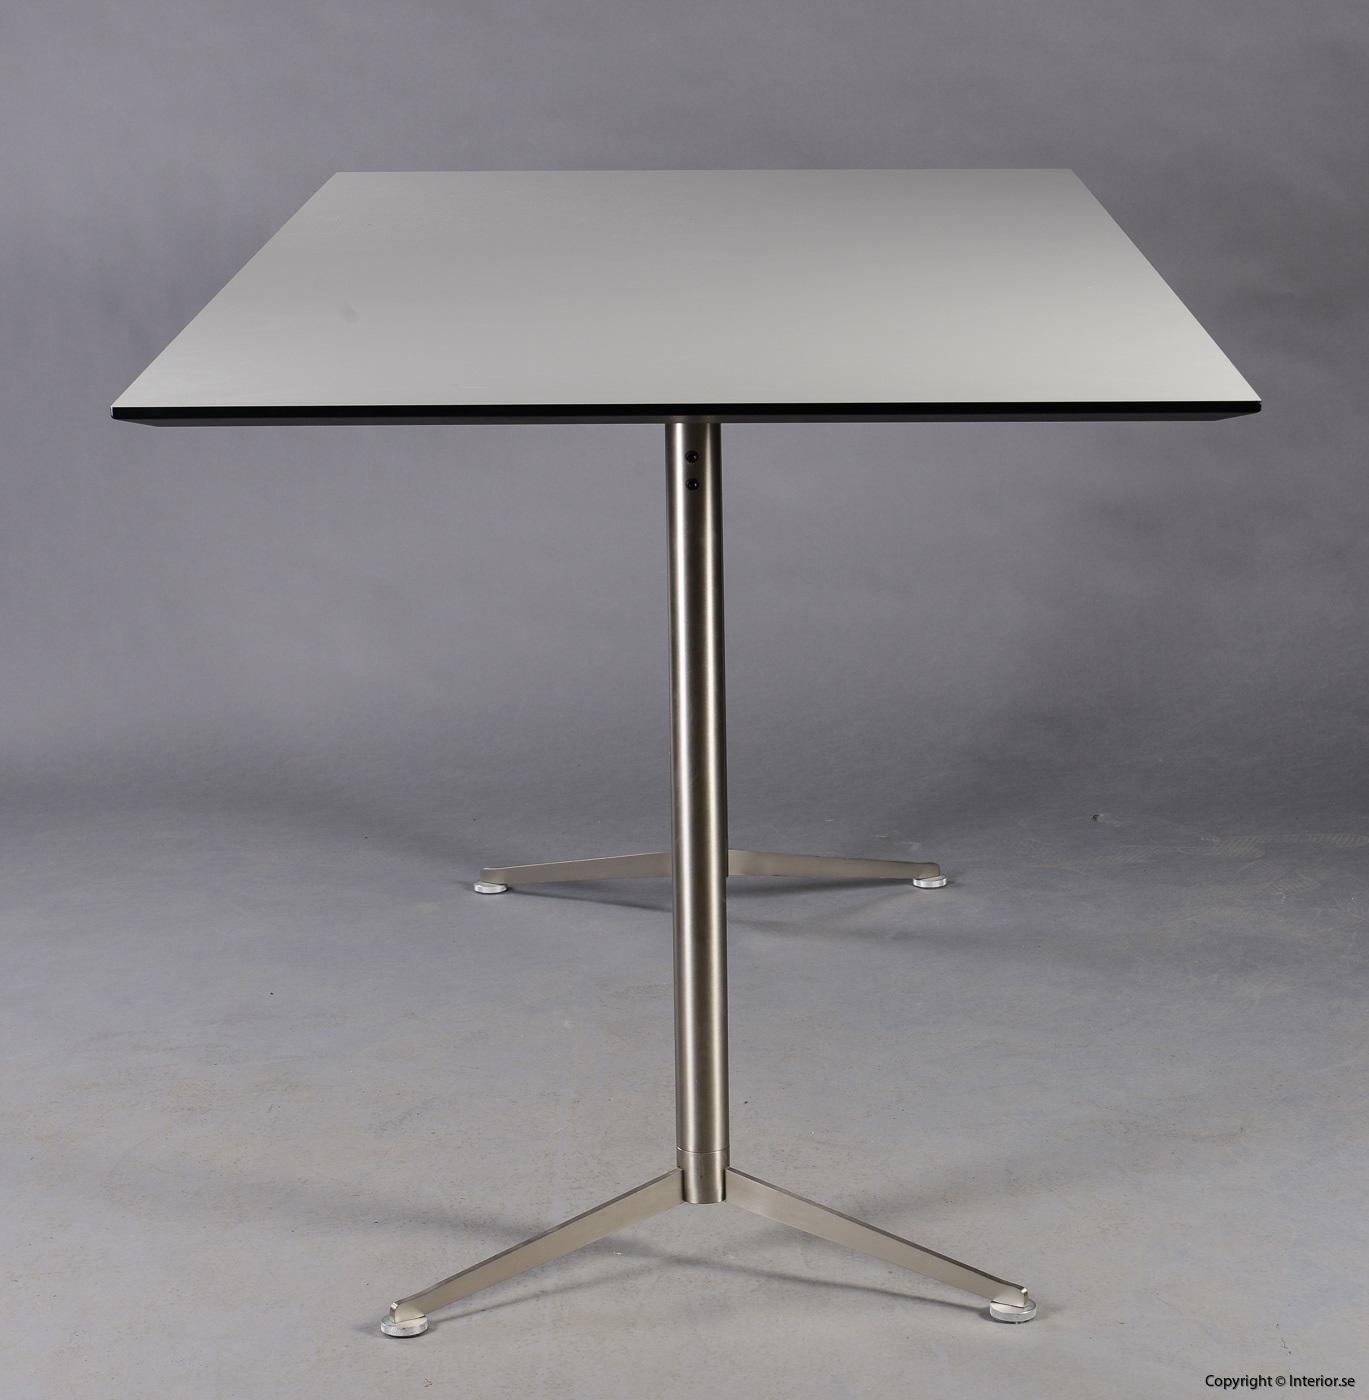 1 Bord Pausitan Spinal Table Paul Leroy begagnade kontorsmöbler designmöbler (5)